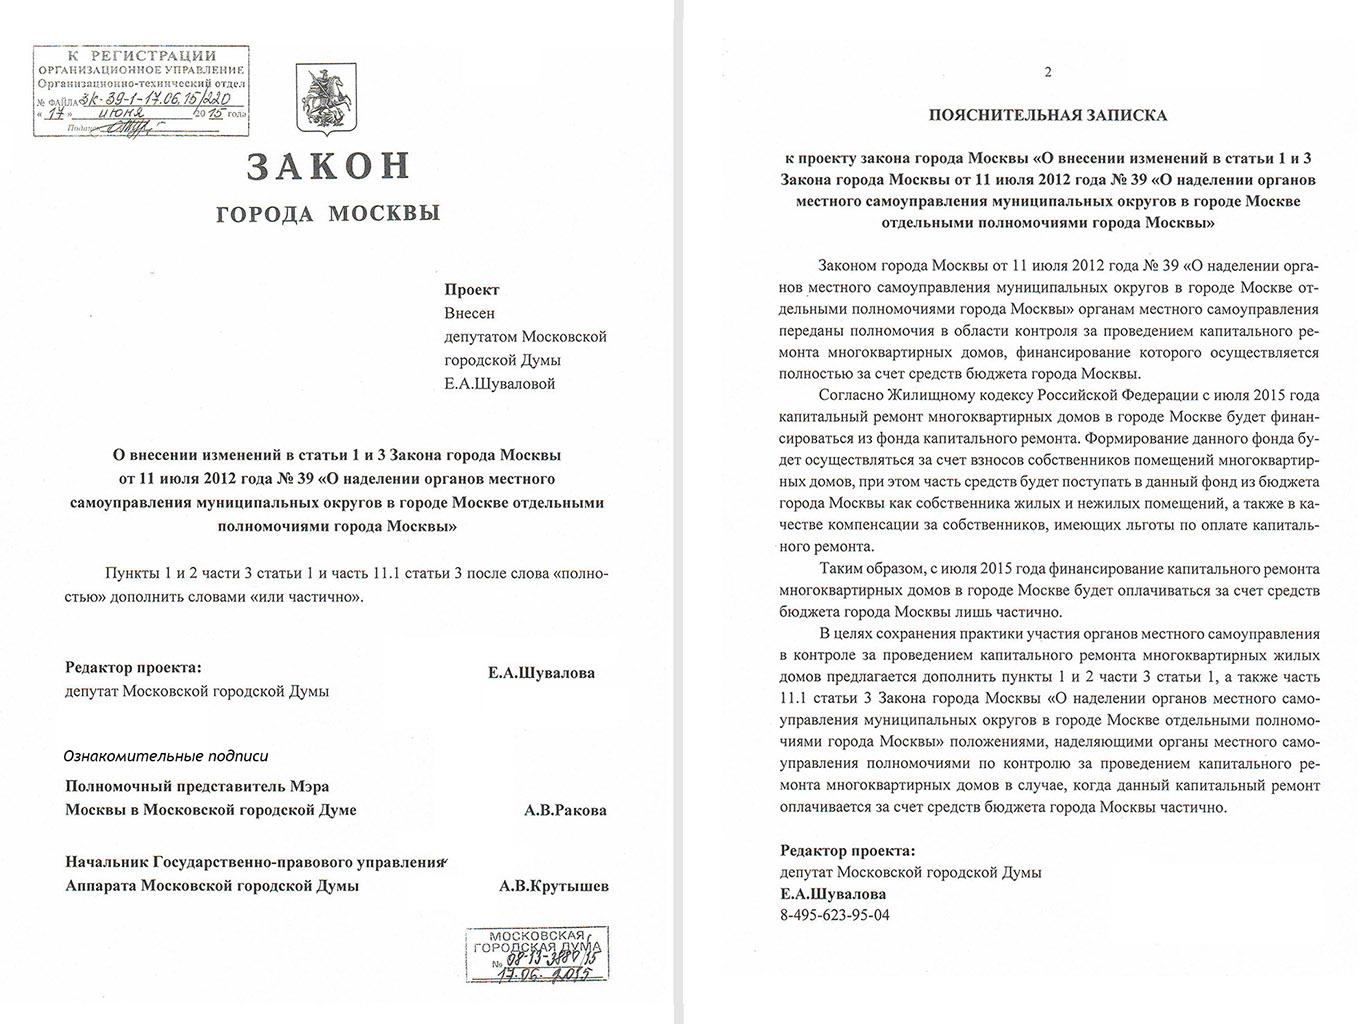 Проект Закона Е.А.Шуваловой о контроле за капремонтом